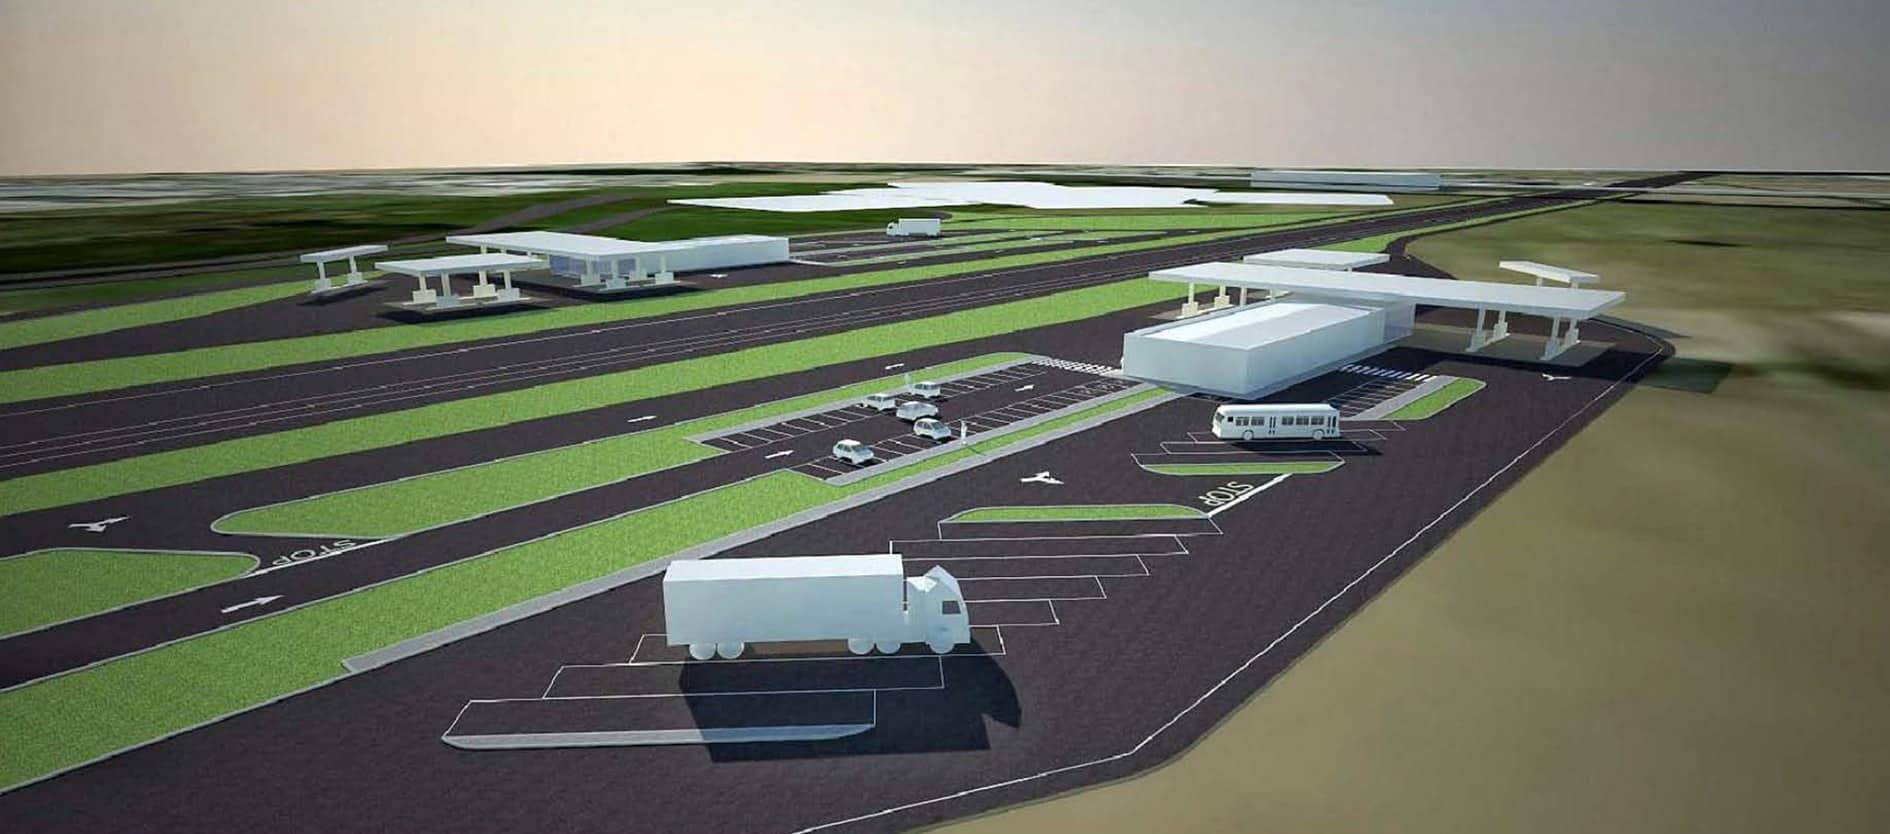 Un rendering dei parcheggi dedicati ai mezzi pesanti